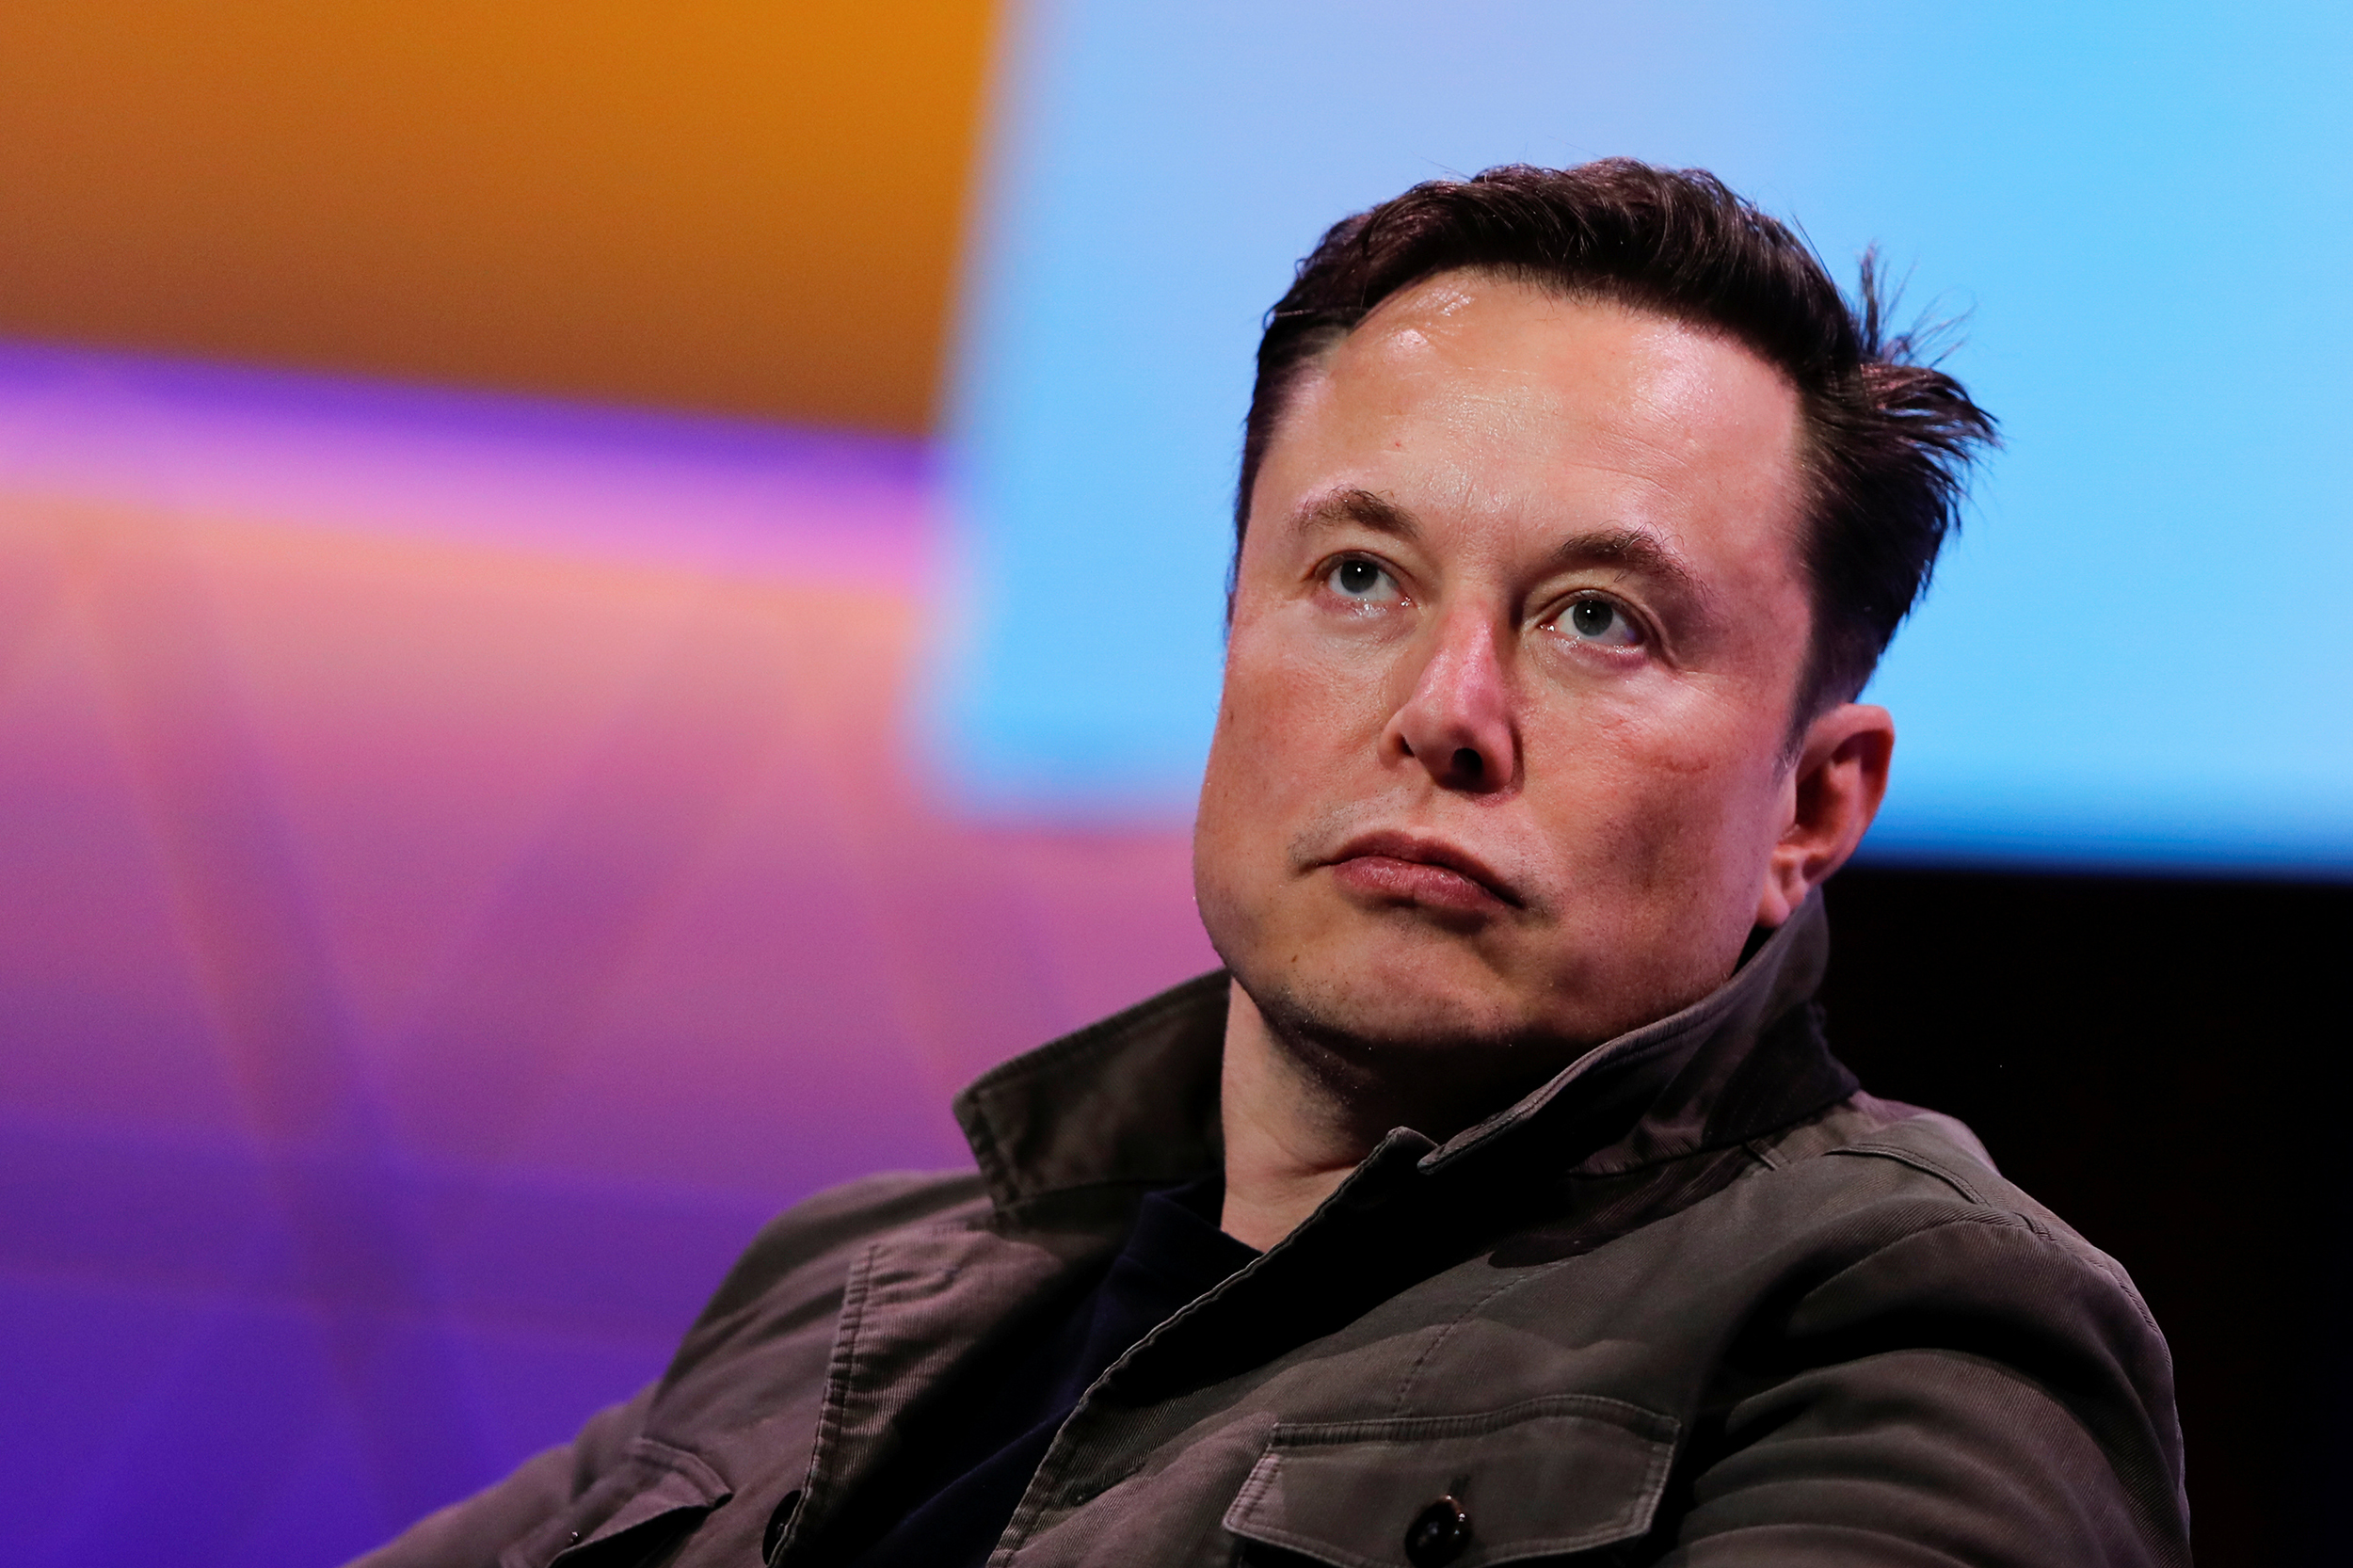 Elon Musk backtracks, says Tesla won't accept bitcoin